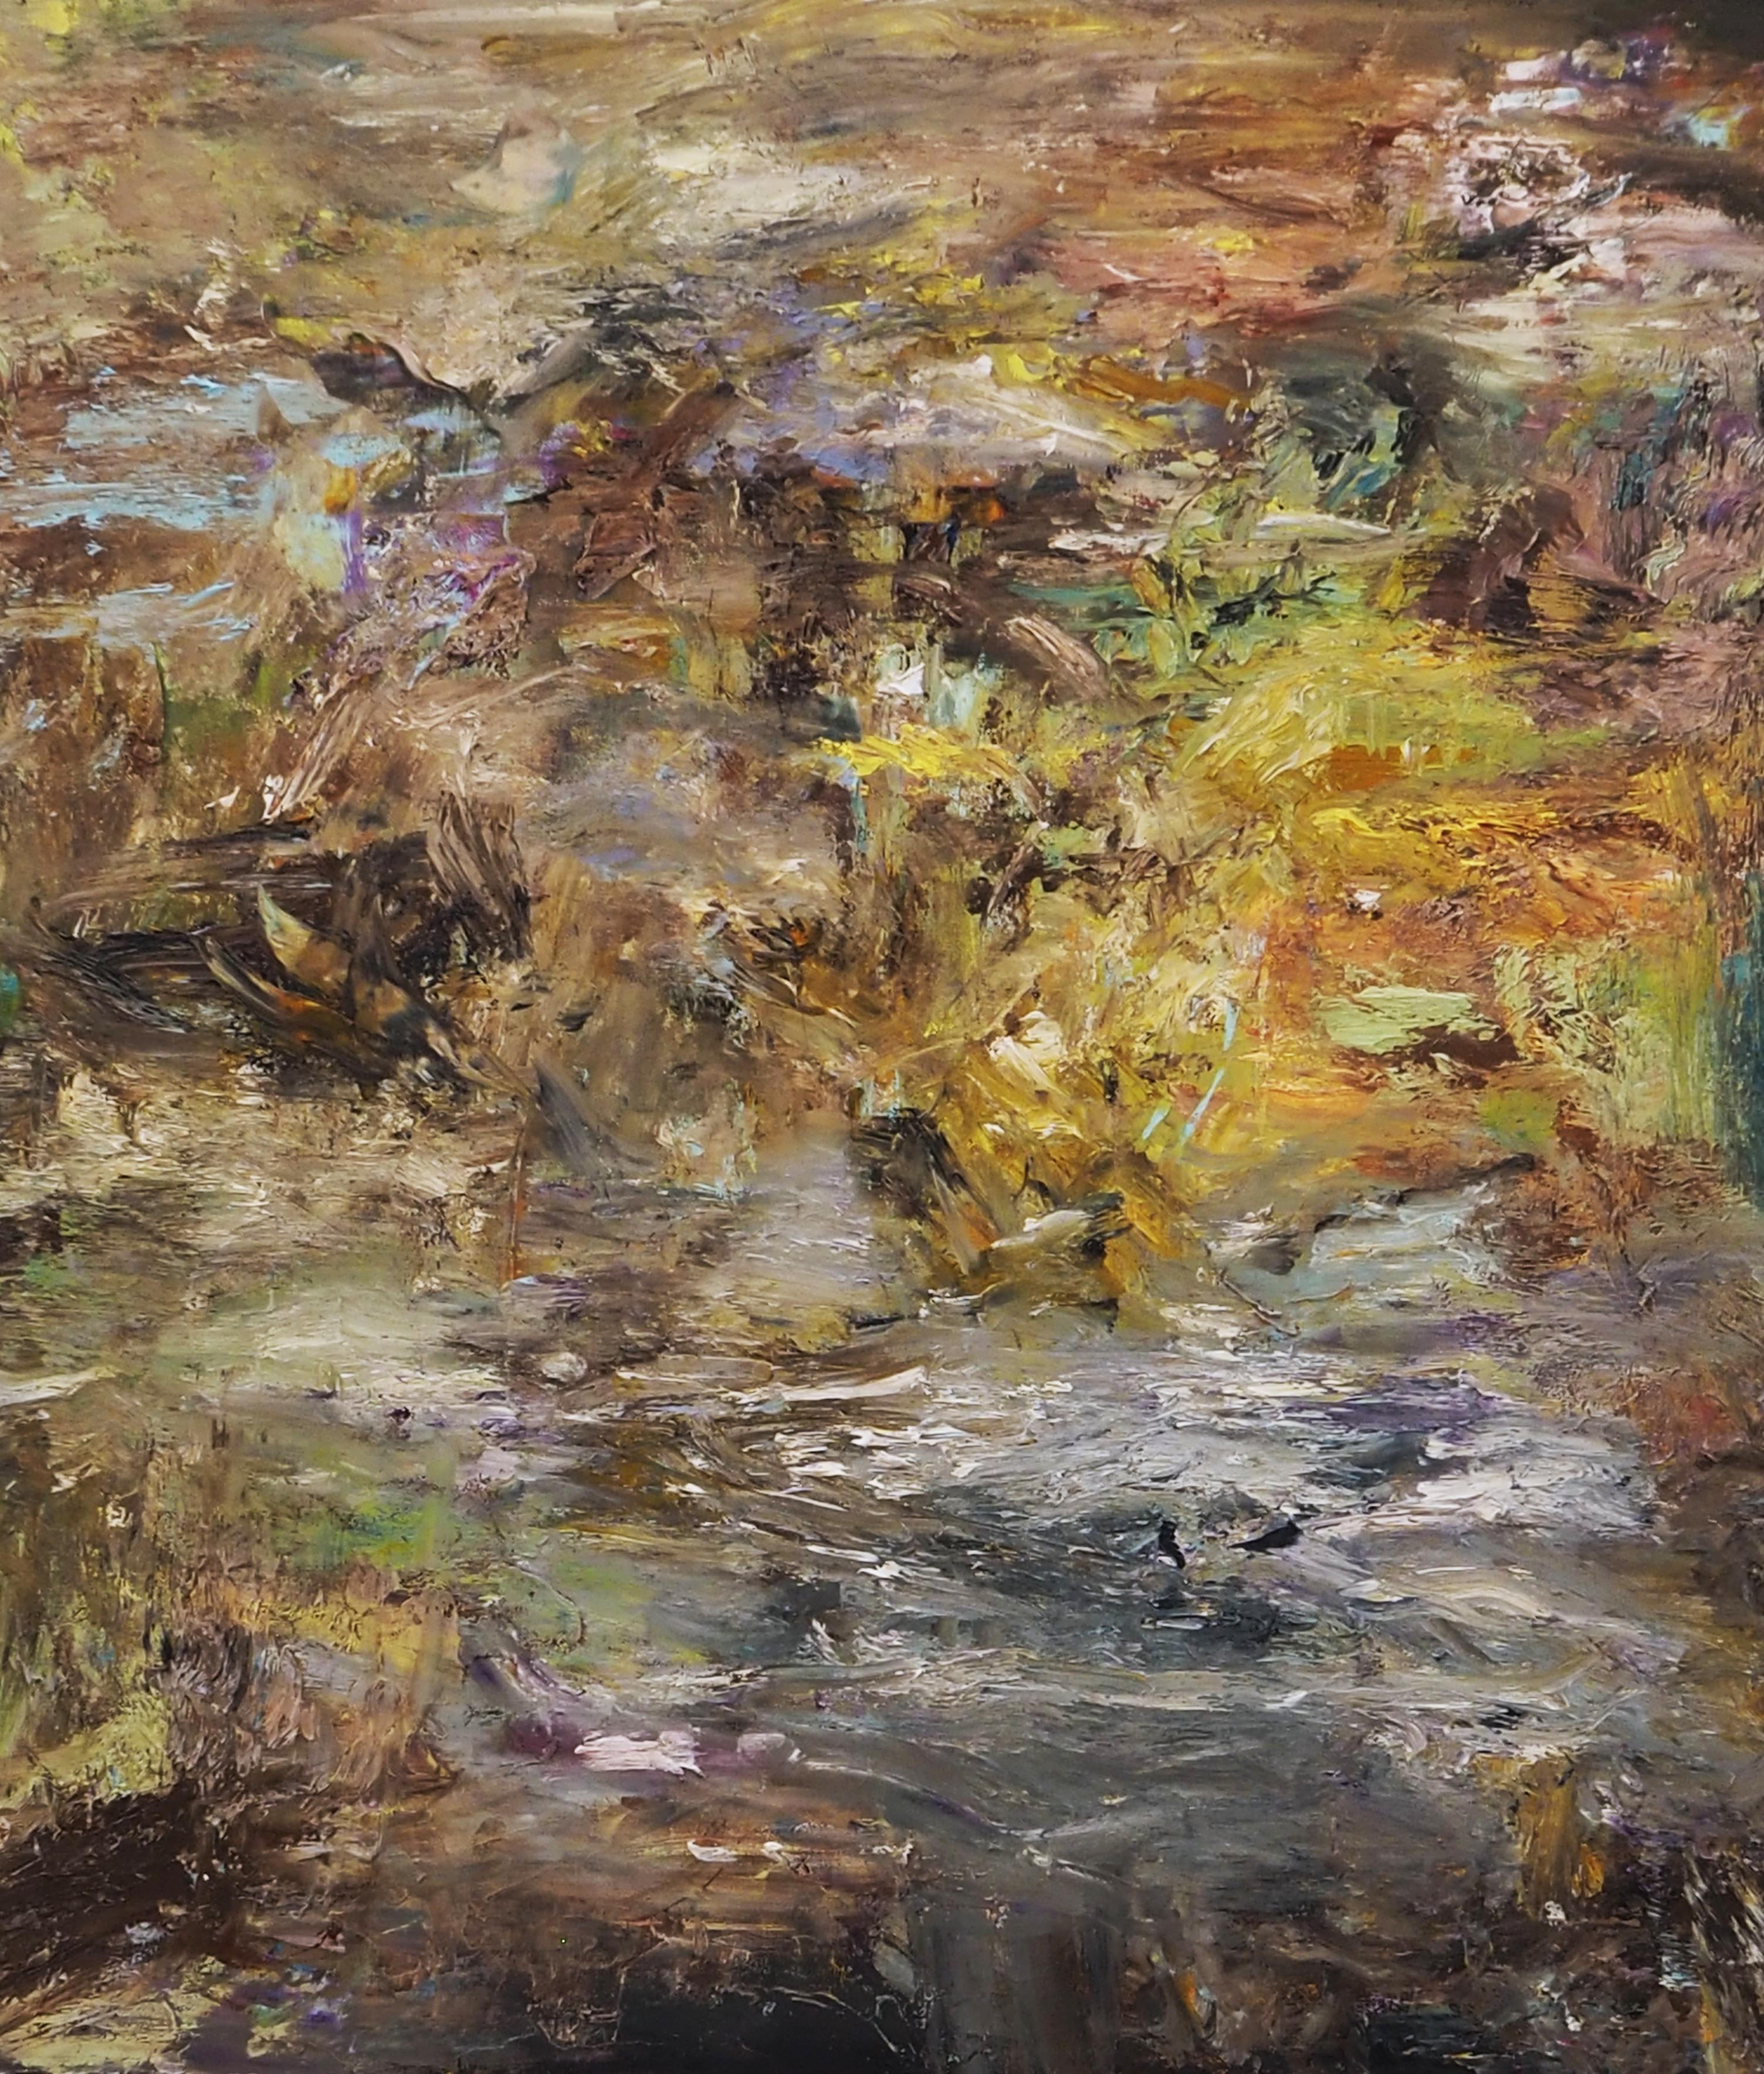 Isabella Nazzarri, Ambientale, olio su tela, 70x80 cm, 2020